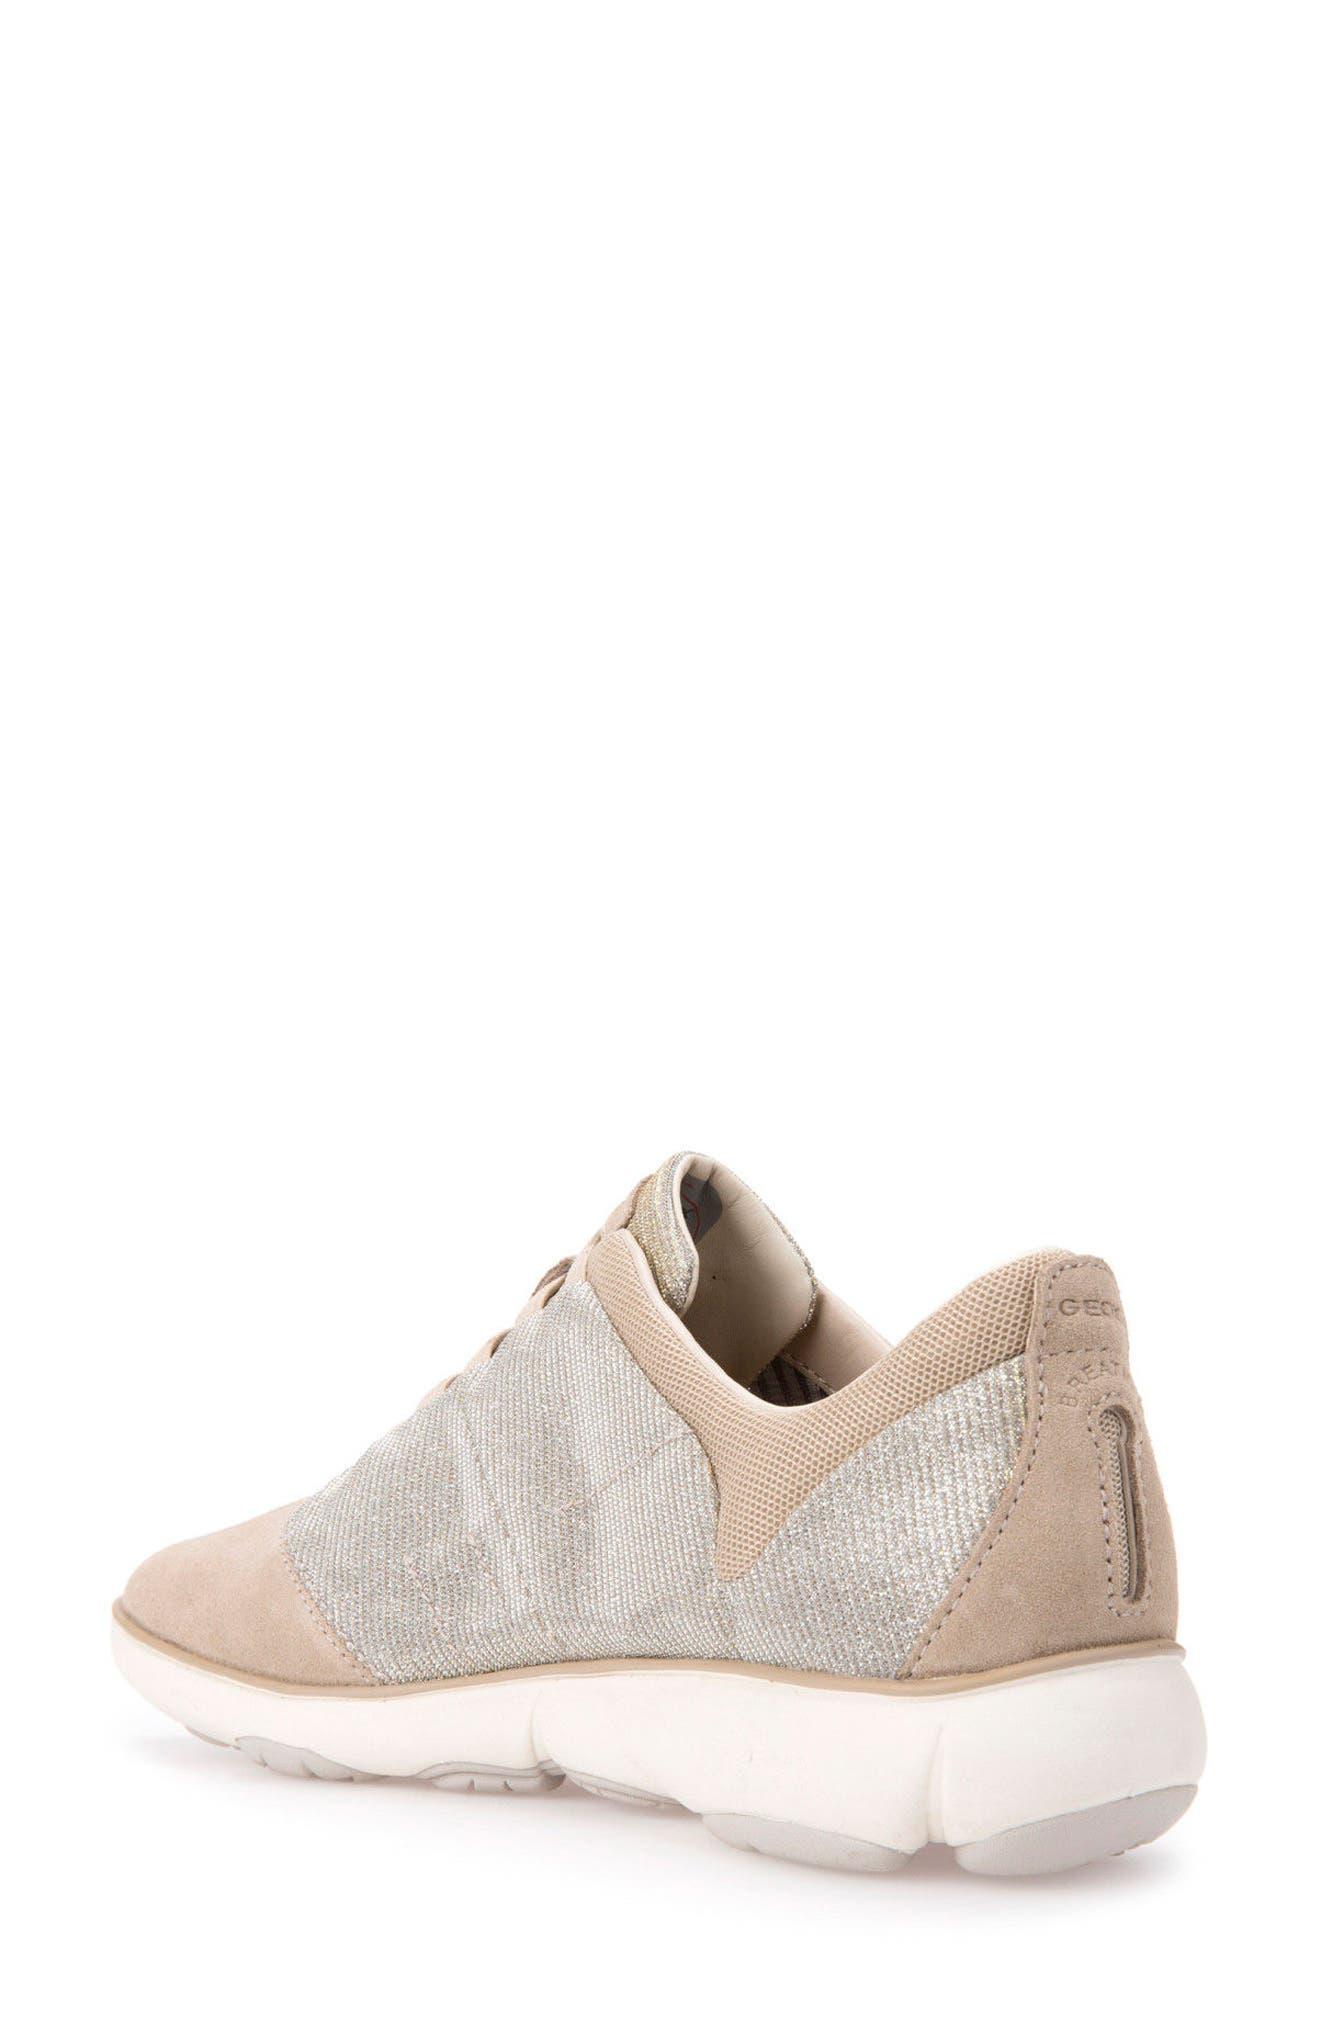 Nebula Slip-On Sneaker,                             Alternate thumbnail 2, color,                             Taupe Fabric